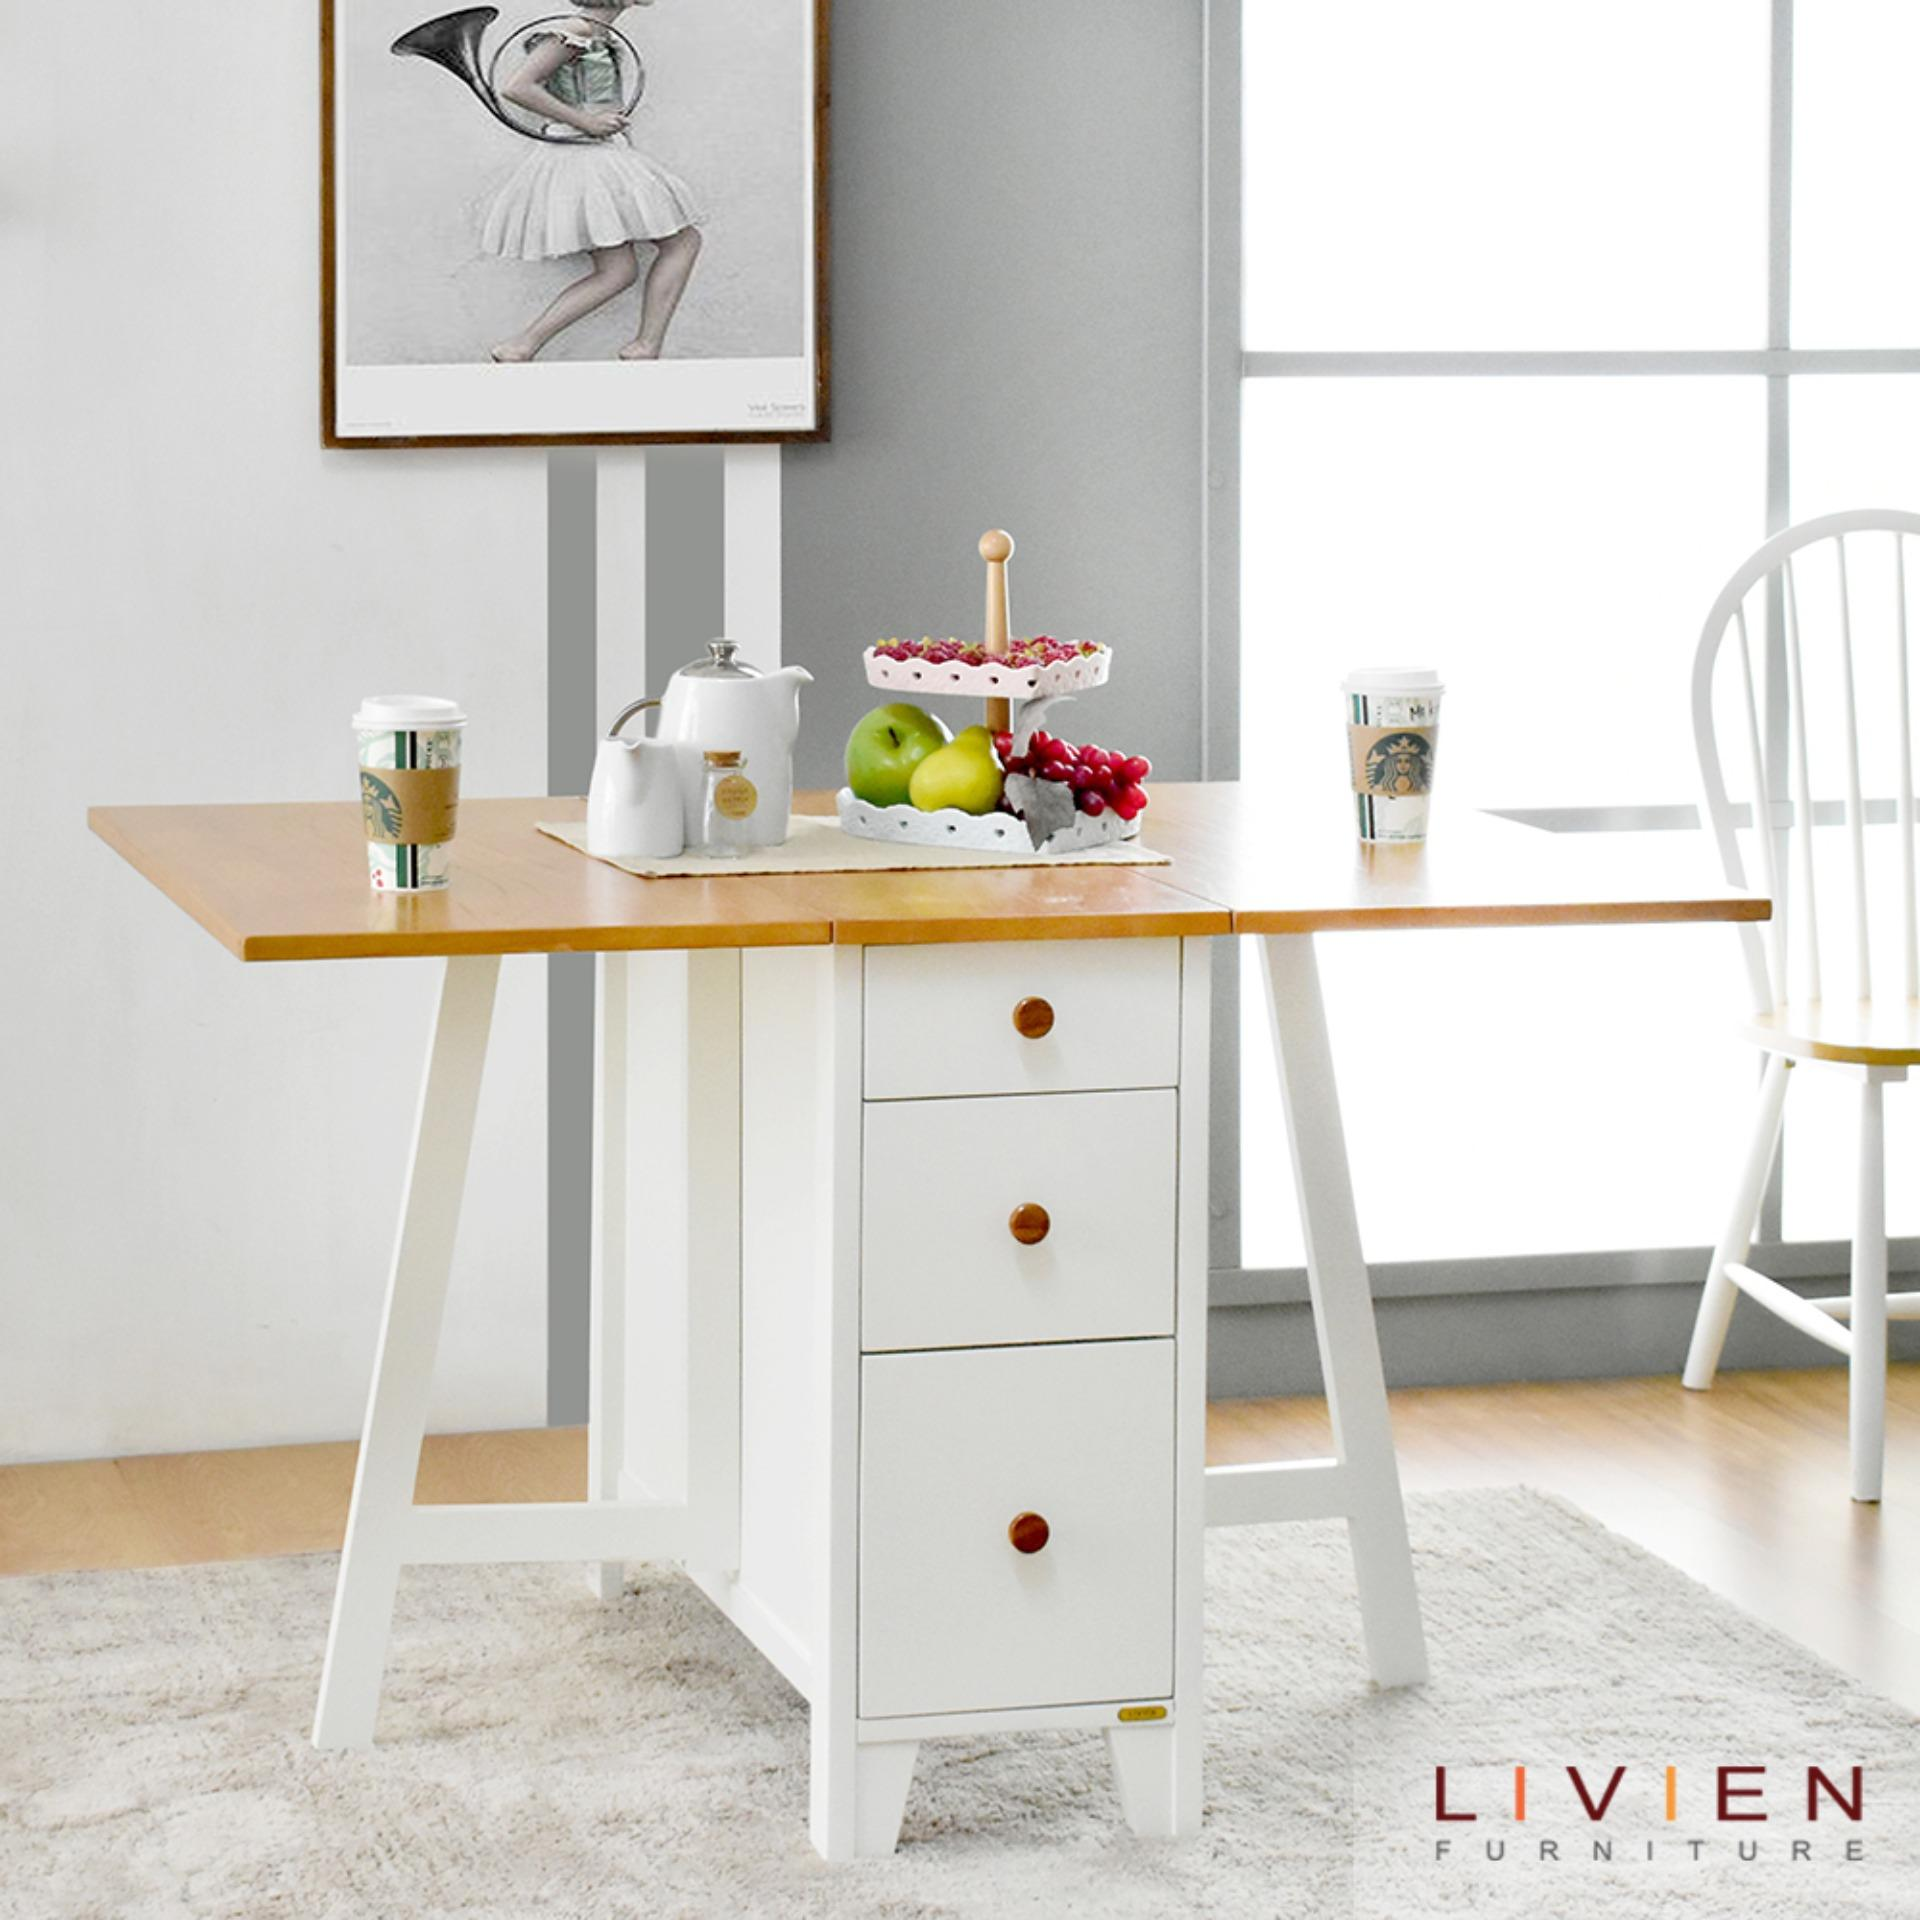 Livien - Meja Makan Lipat Minimalis Transformers Maple Story By Livien Furniture.